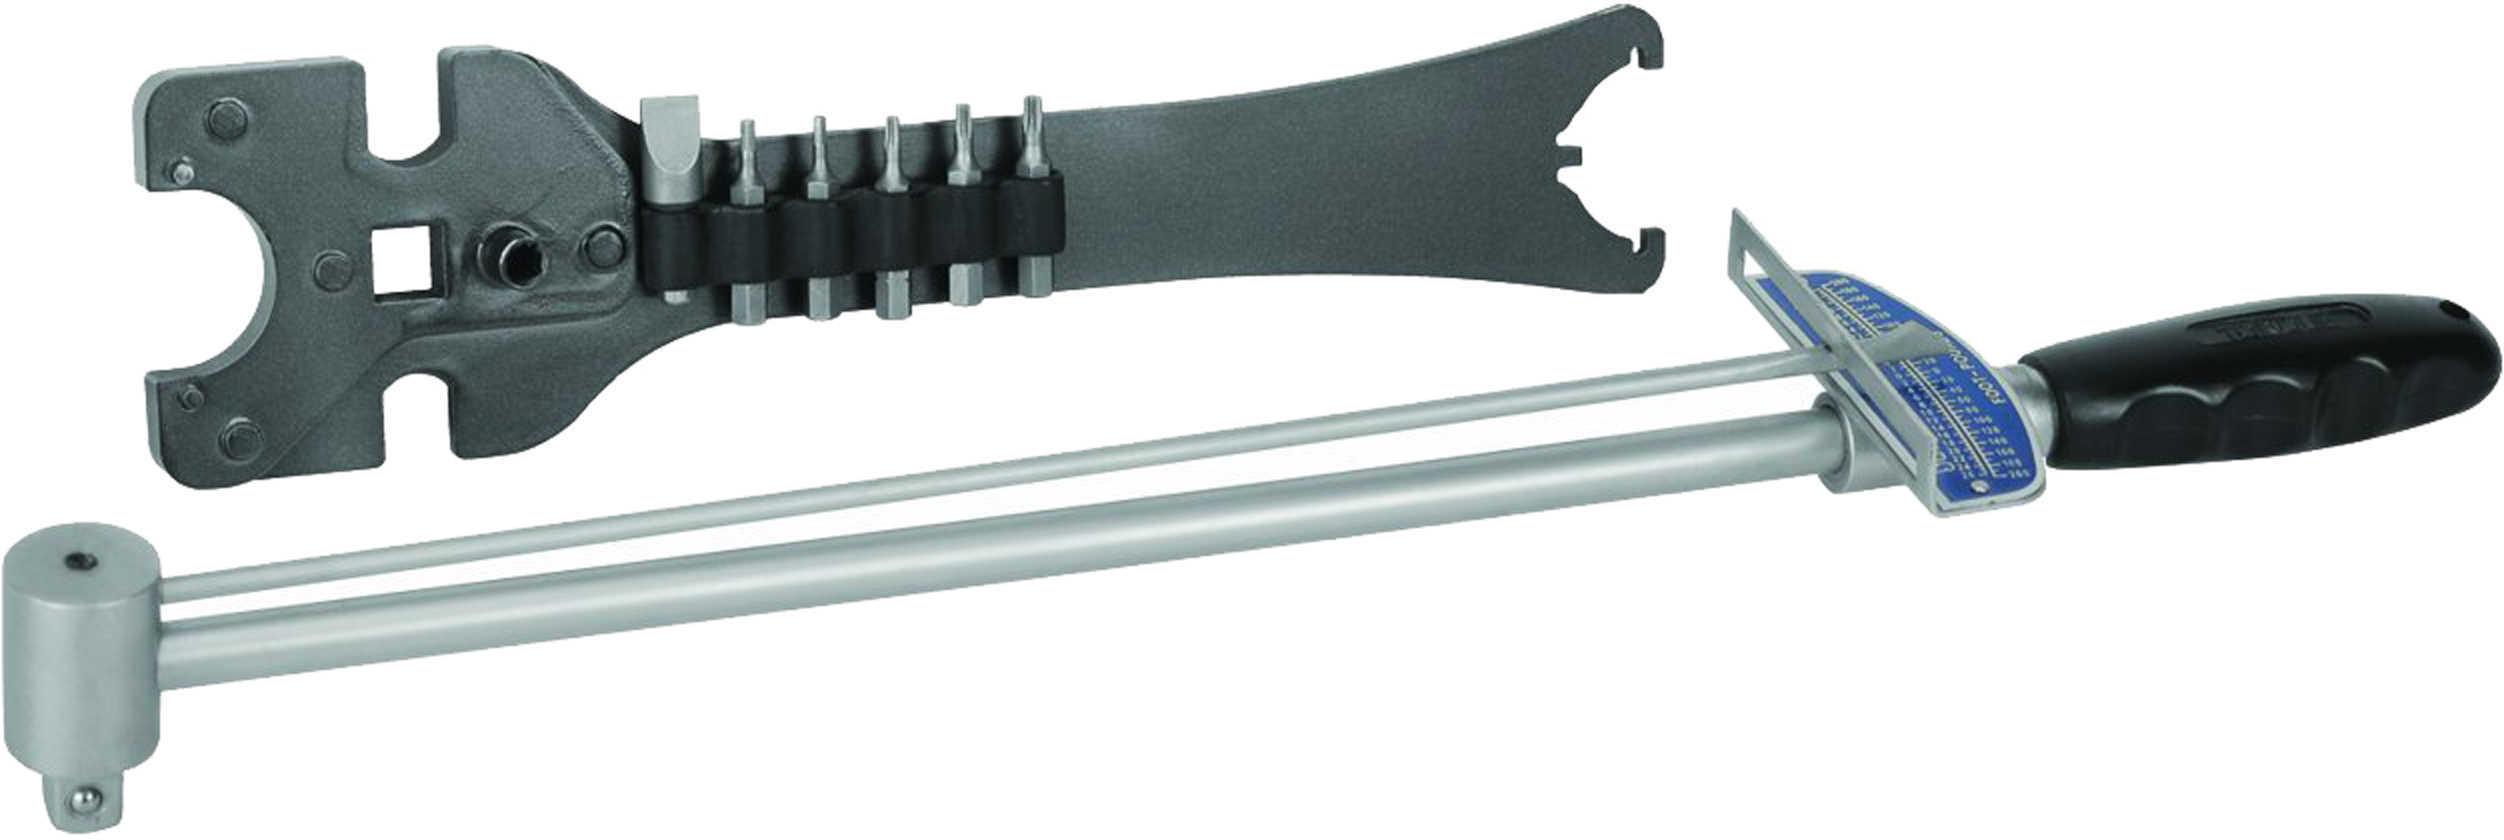 Wheeler AR Combo Tool W/Torque Wrench